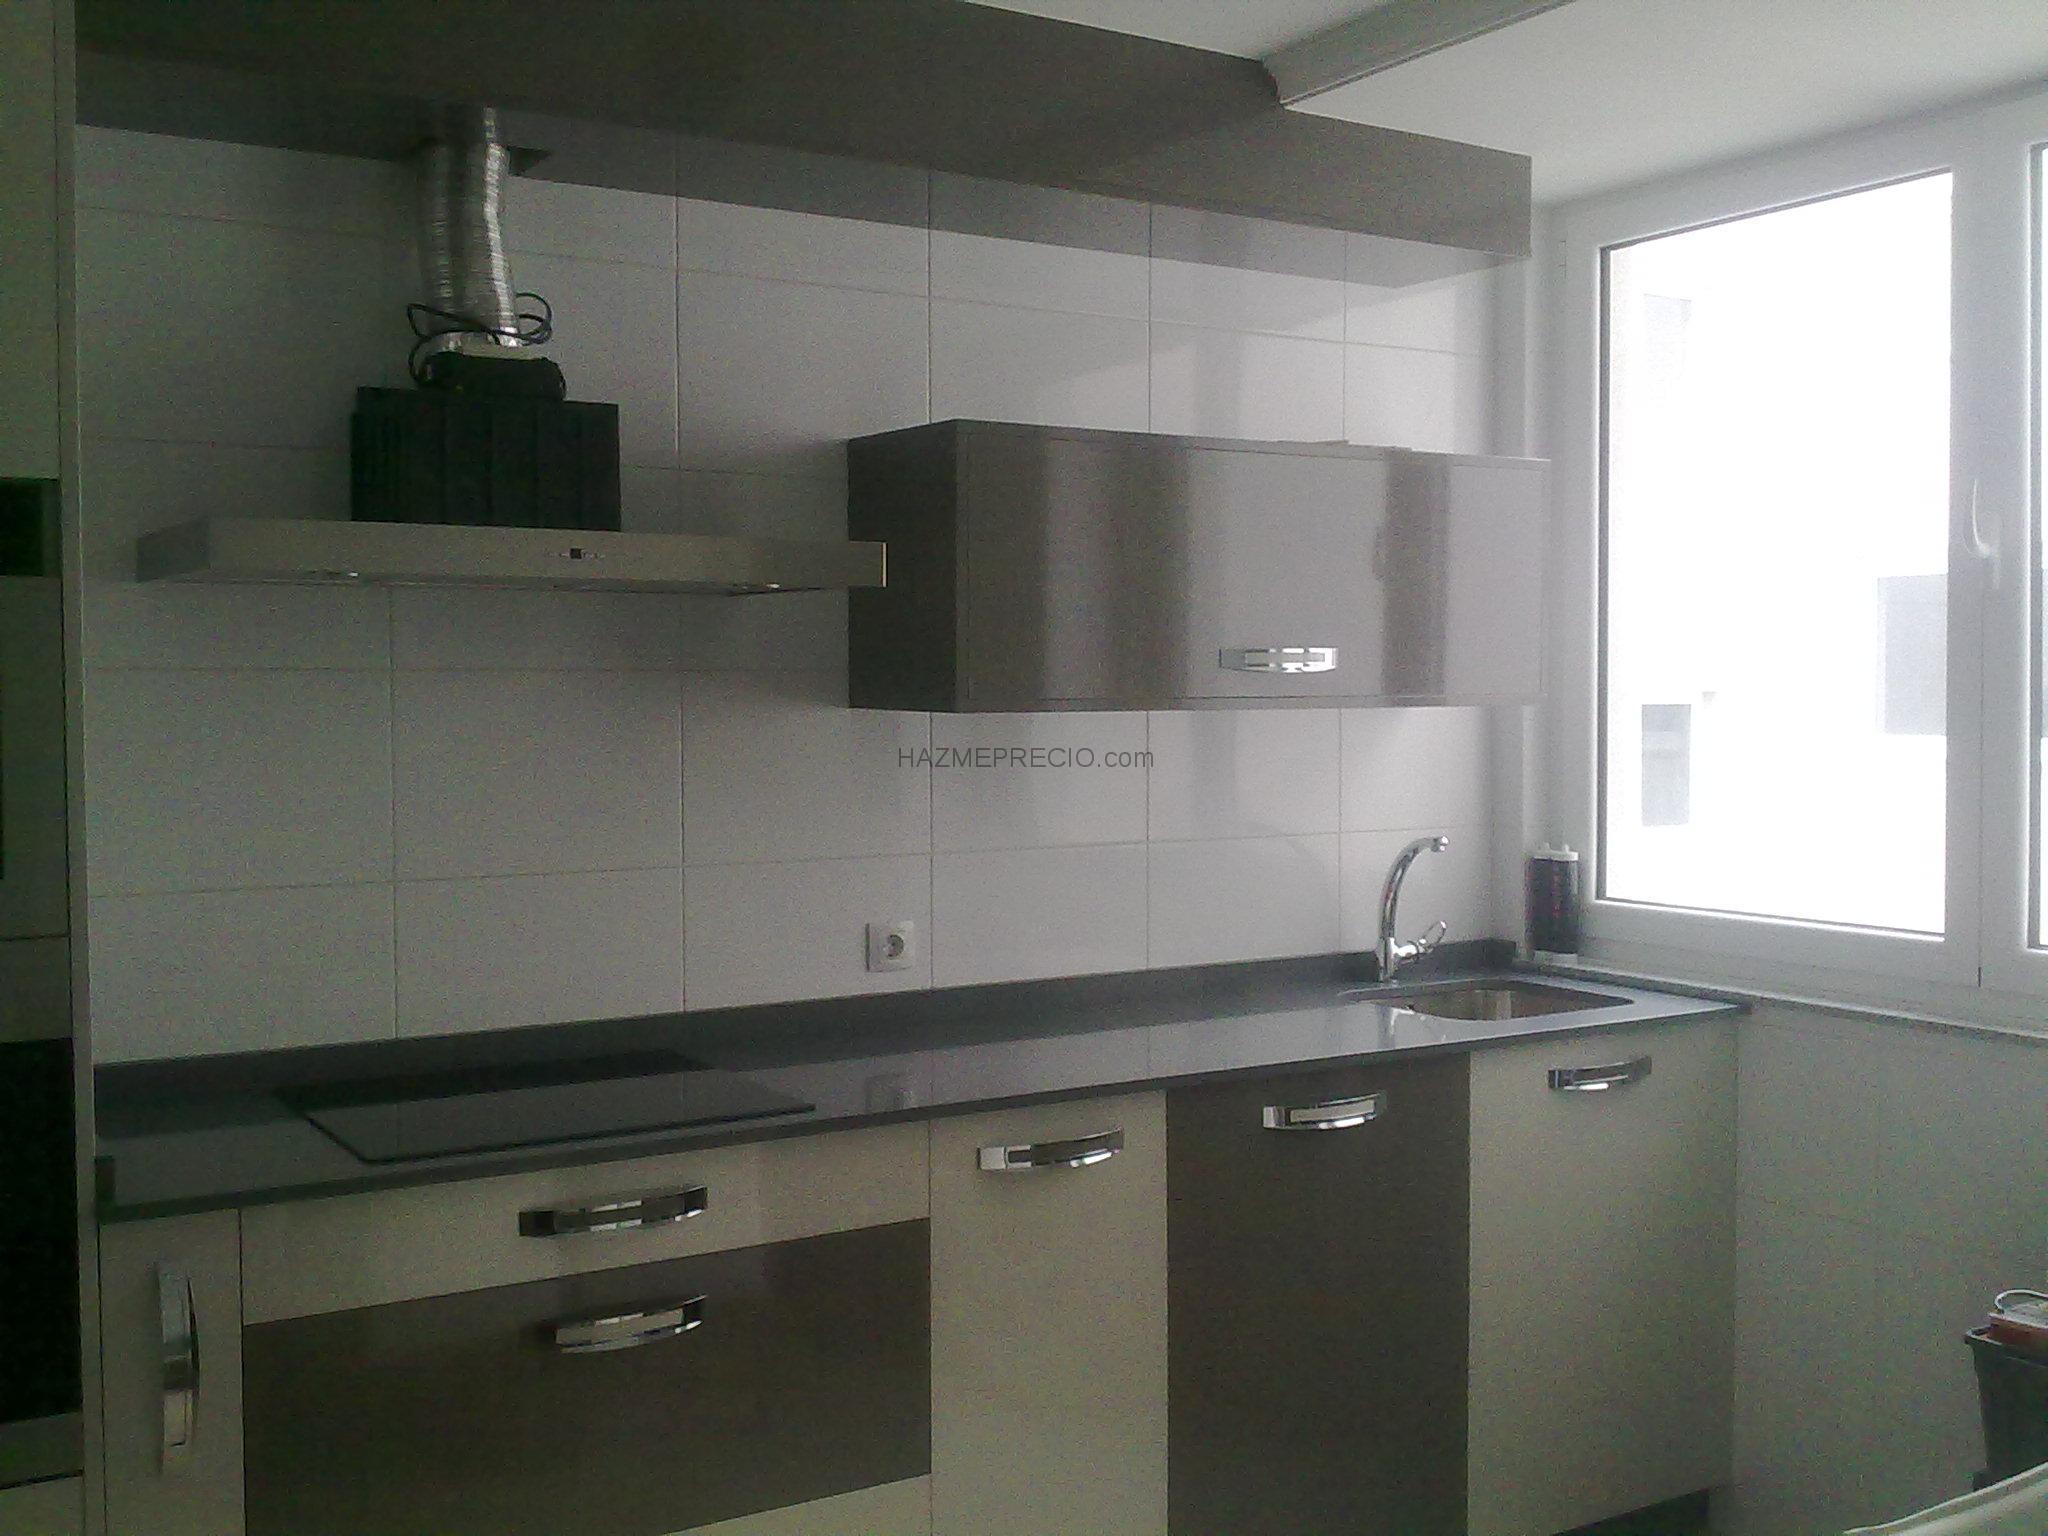 Felix paris montajes de carpinteria 27003 lugo lugo for Amueblamiento de cocinas